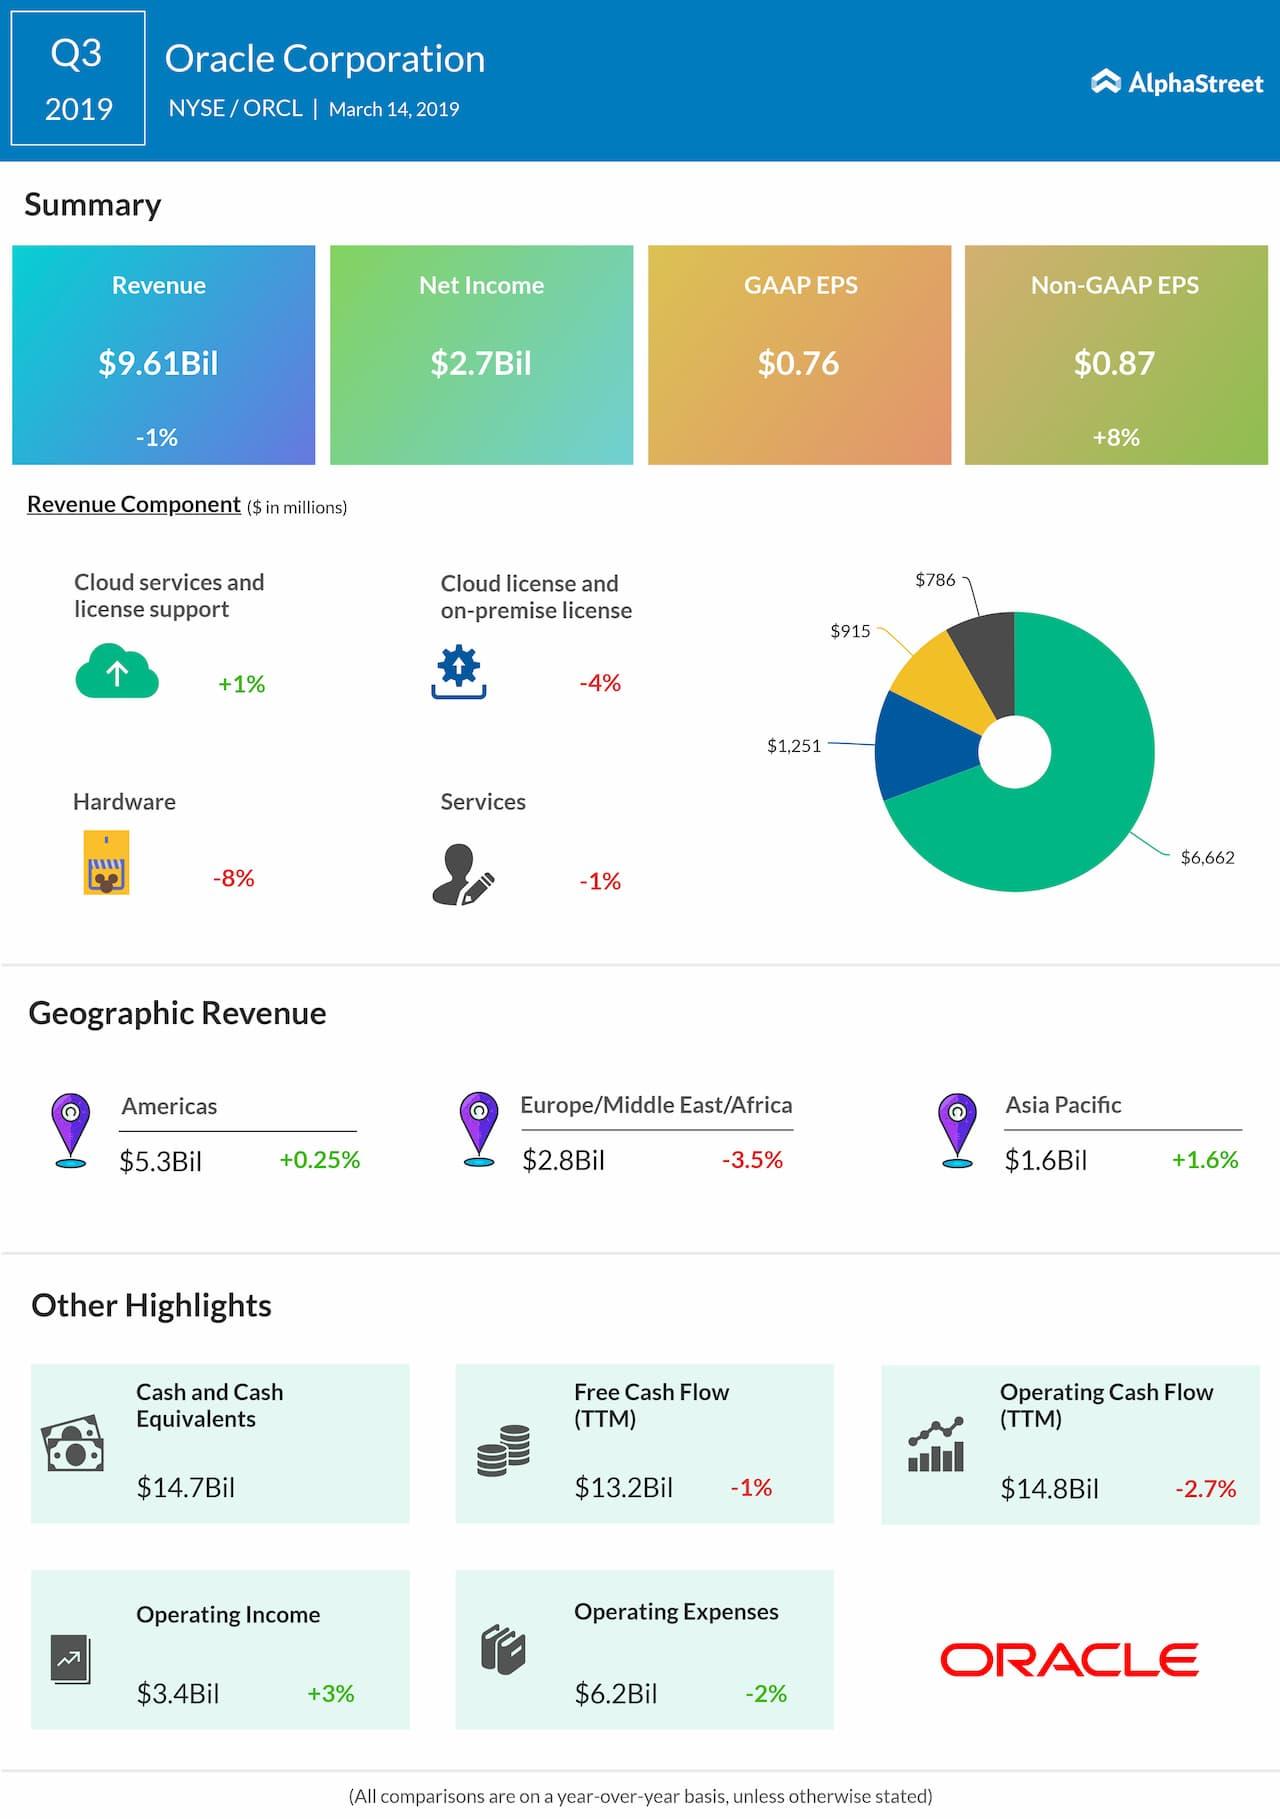 Oracle third quarter 2019 earnings snapshot